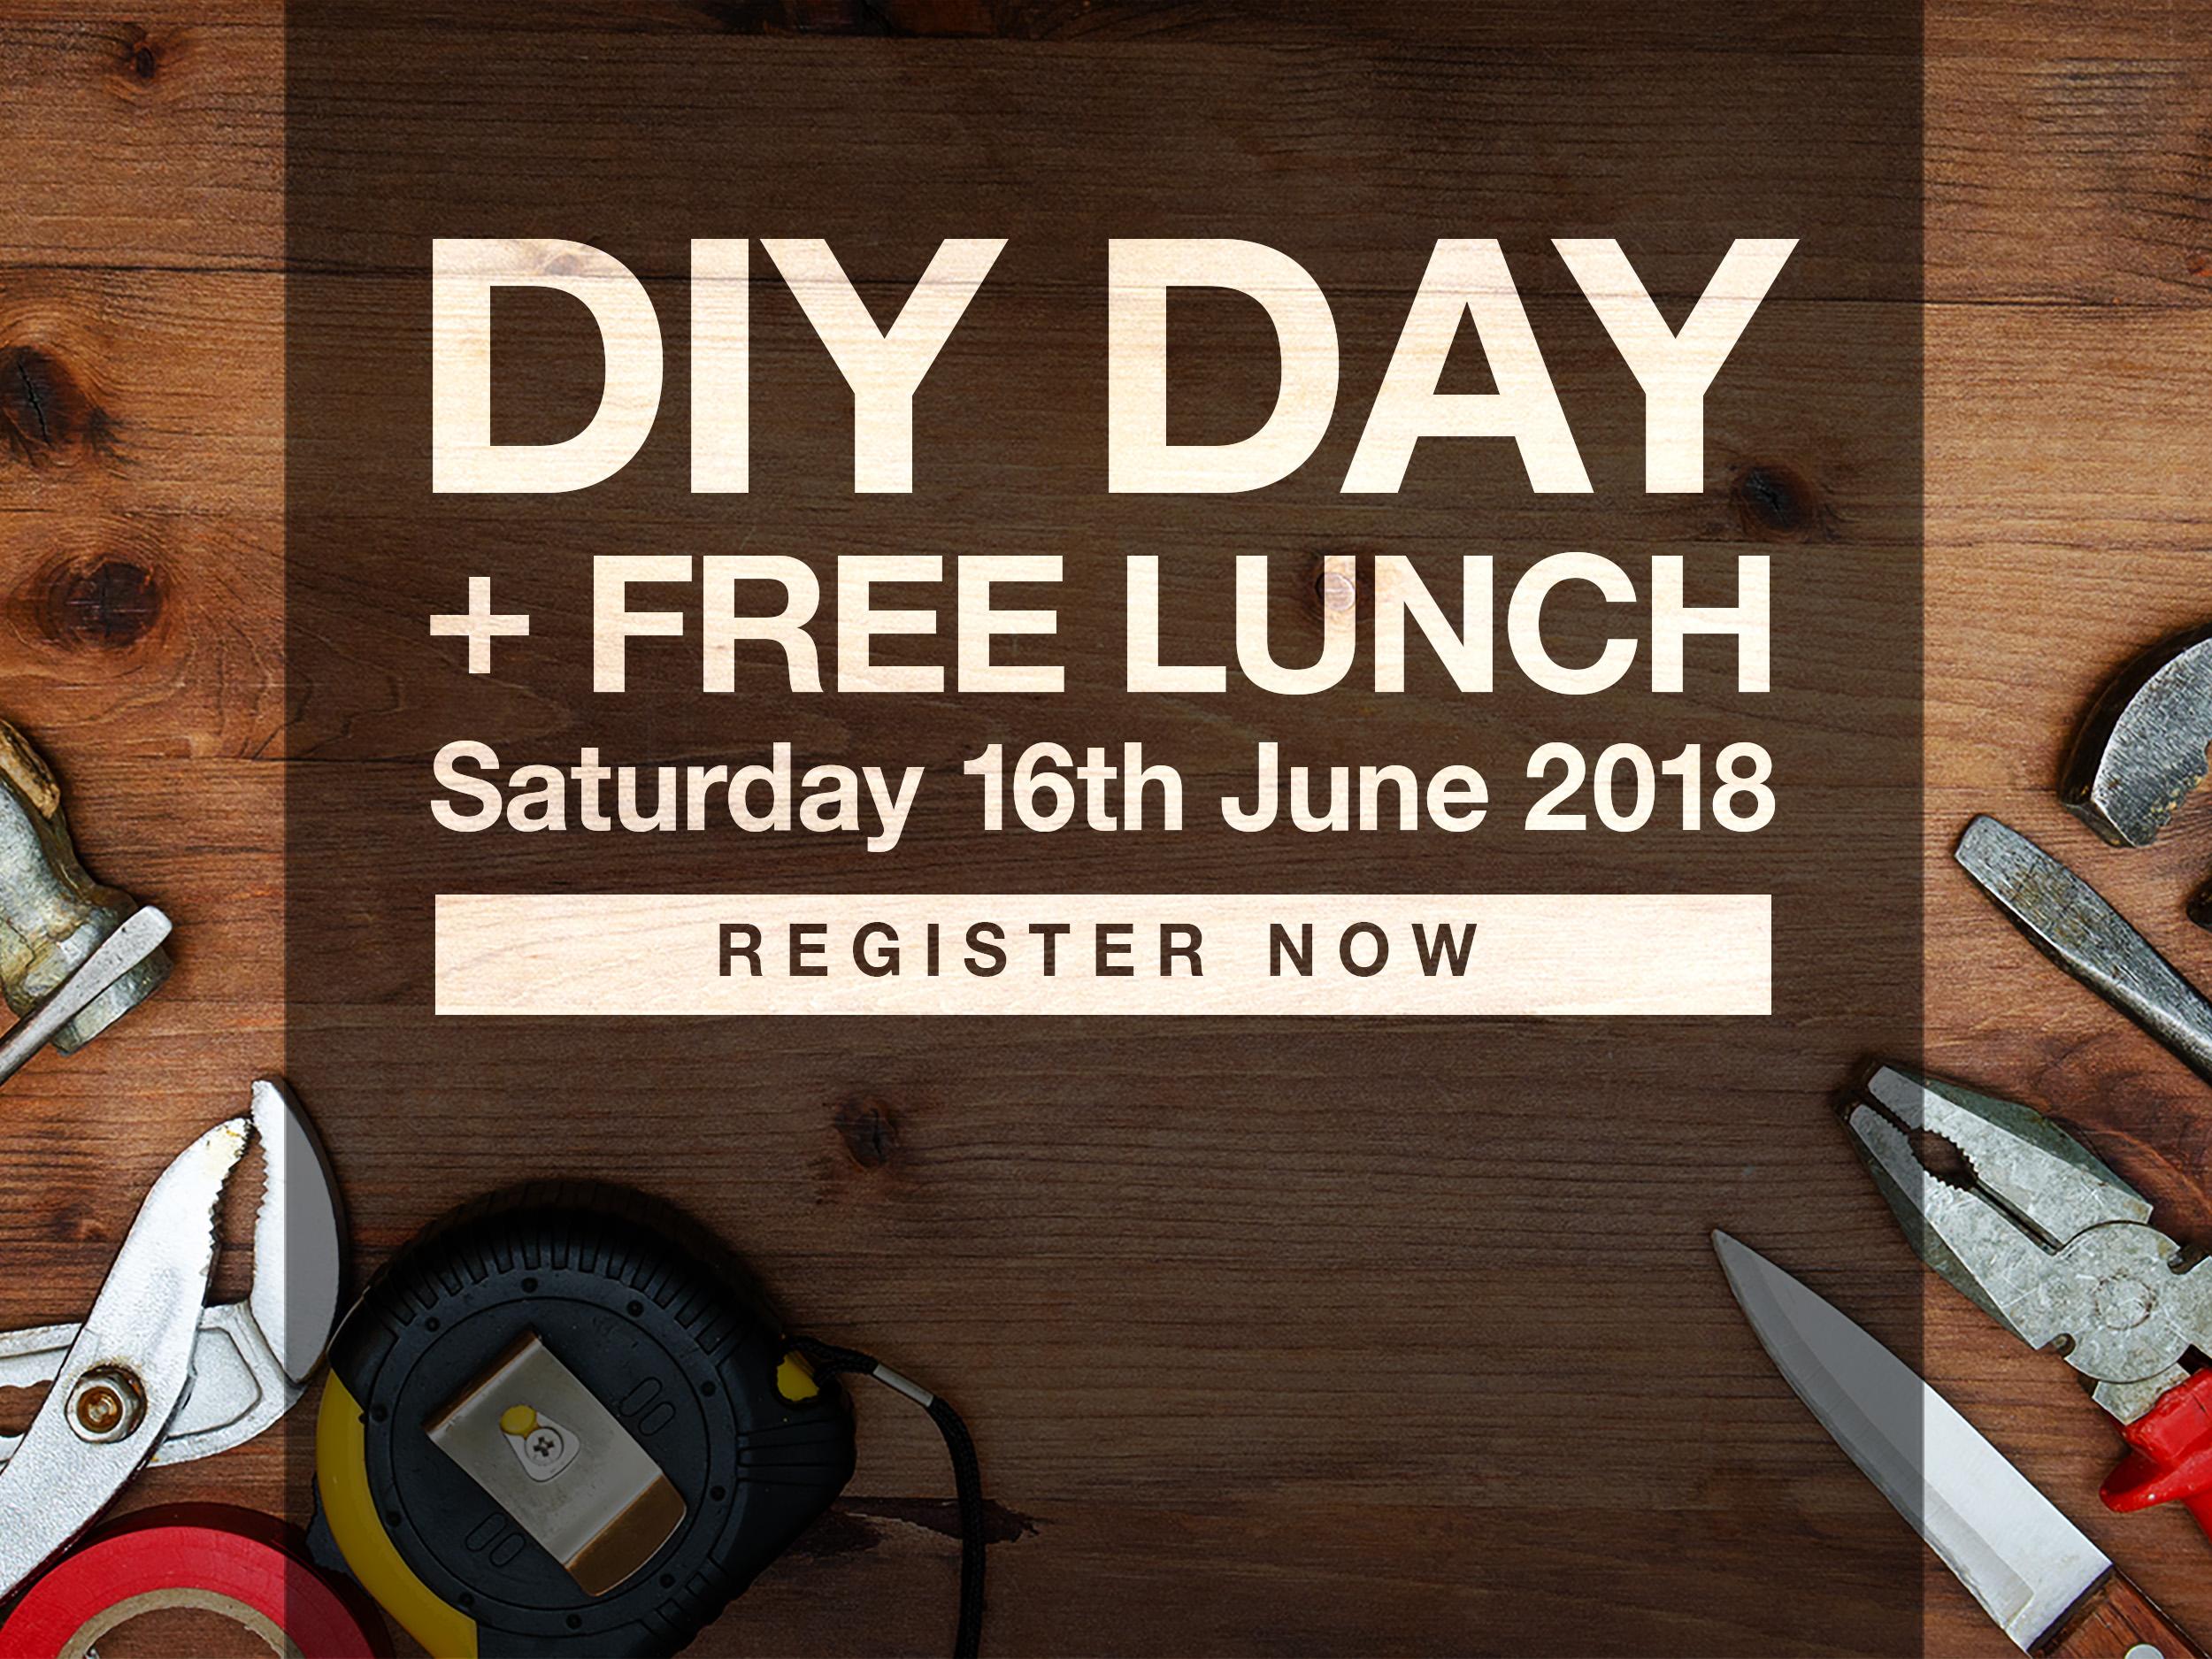 DIY DAY_Website_2500x1875.jpg